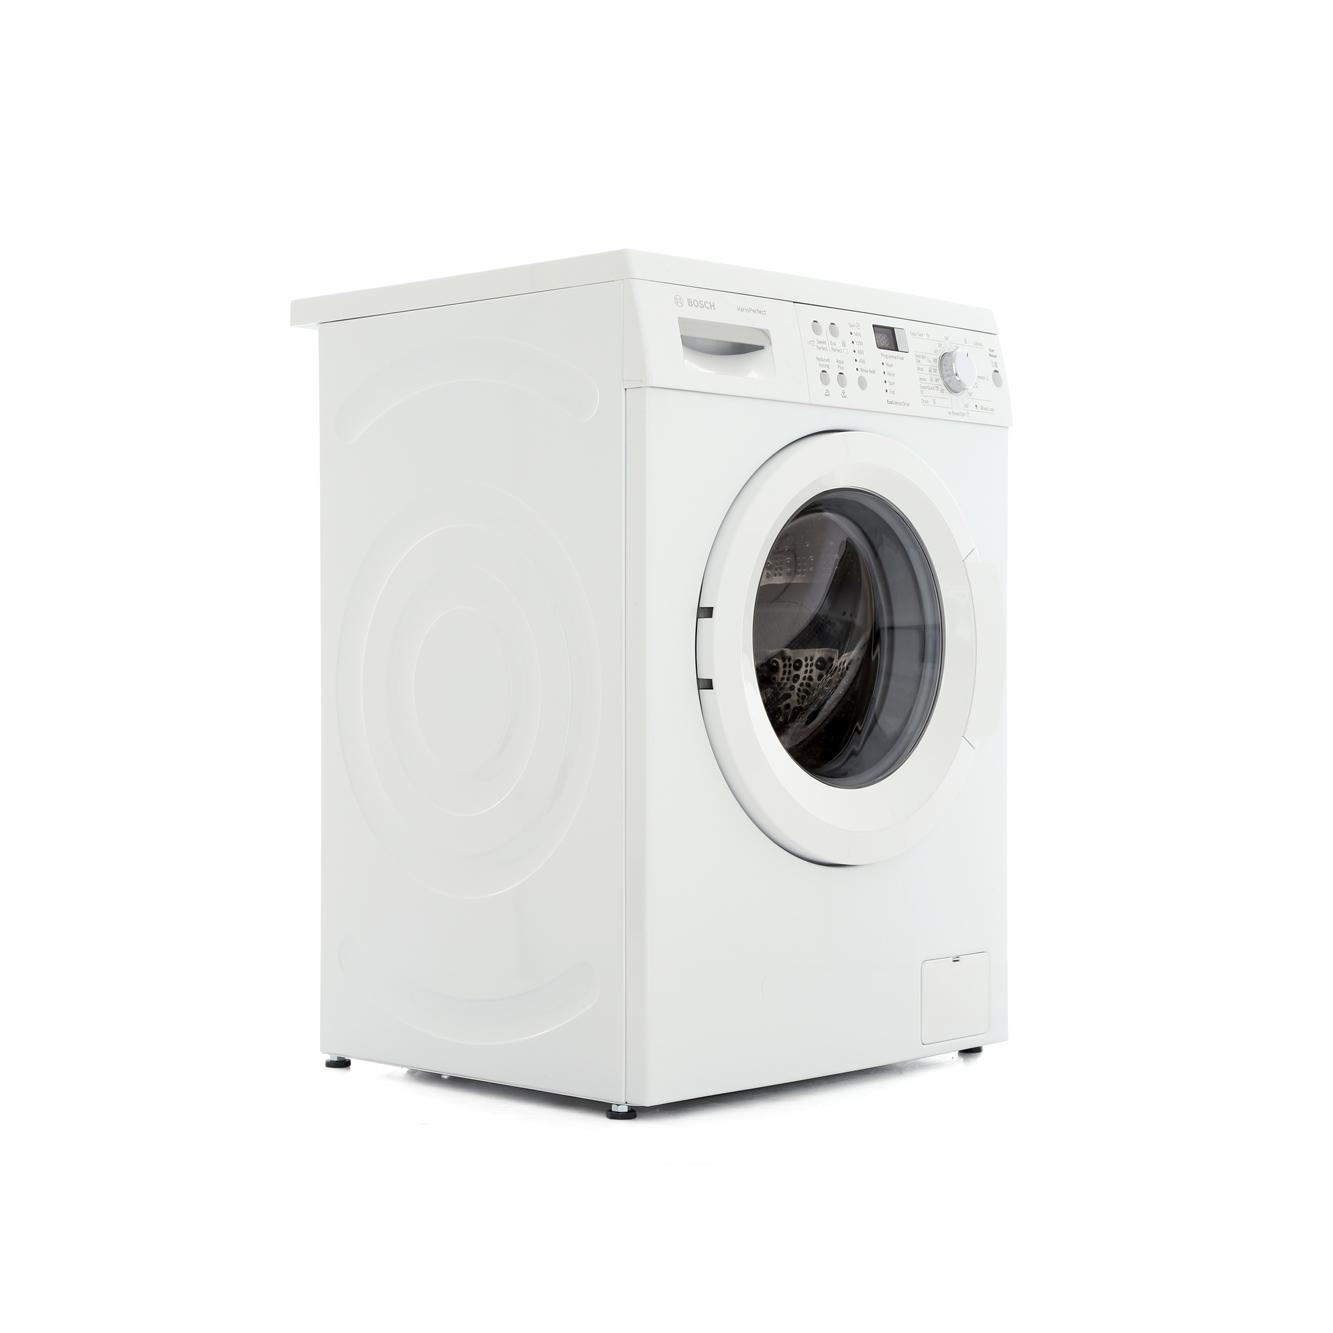 Bosch Series 6 WAQ283S1GB Washing Machine